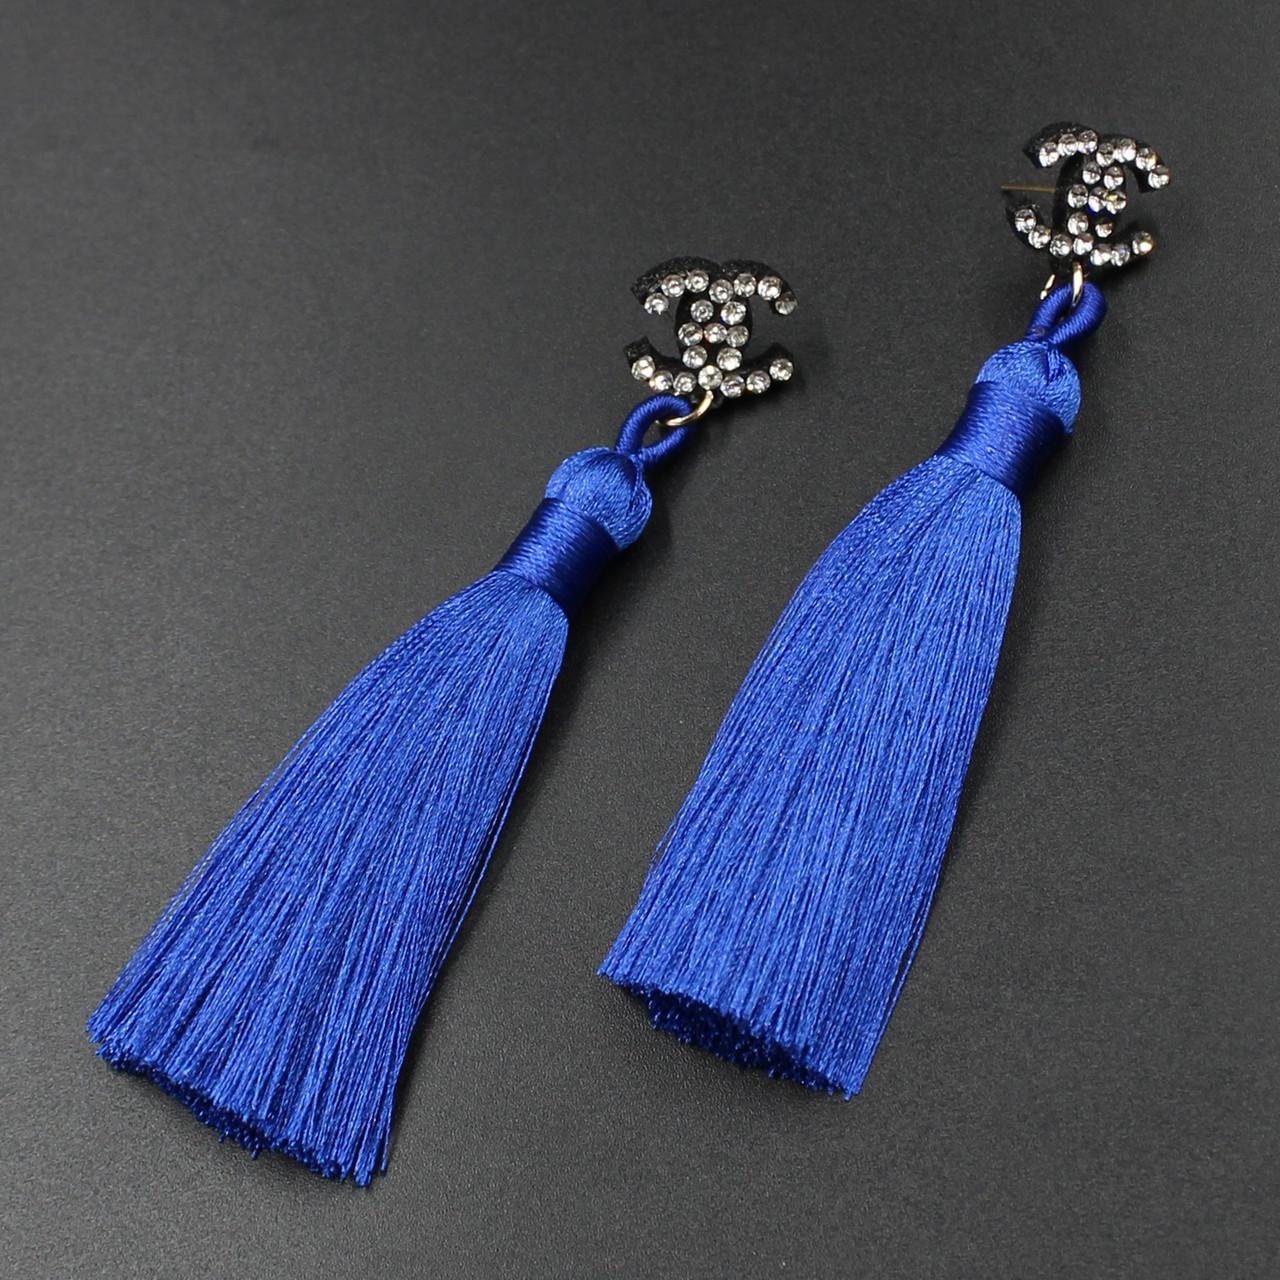 "Серьги-кисти (кисточки)  ""Beterish  blue"" L - 9,5 см"